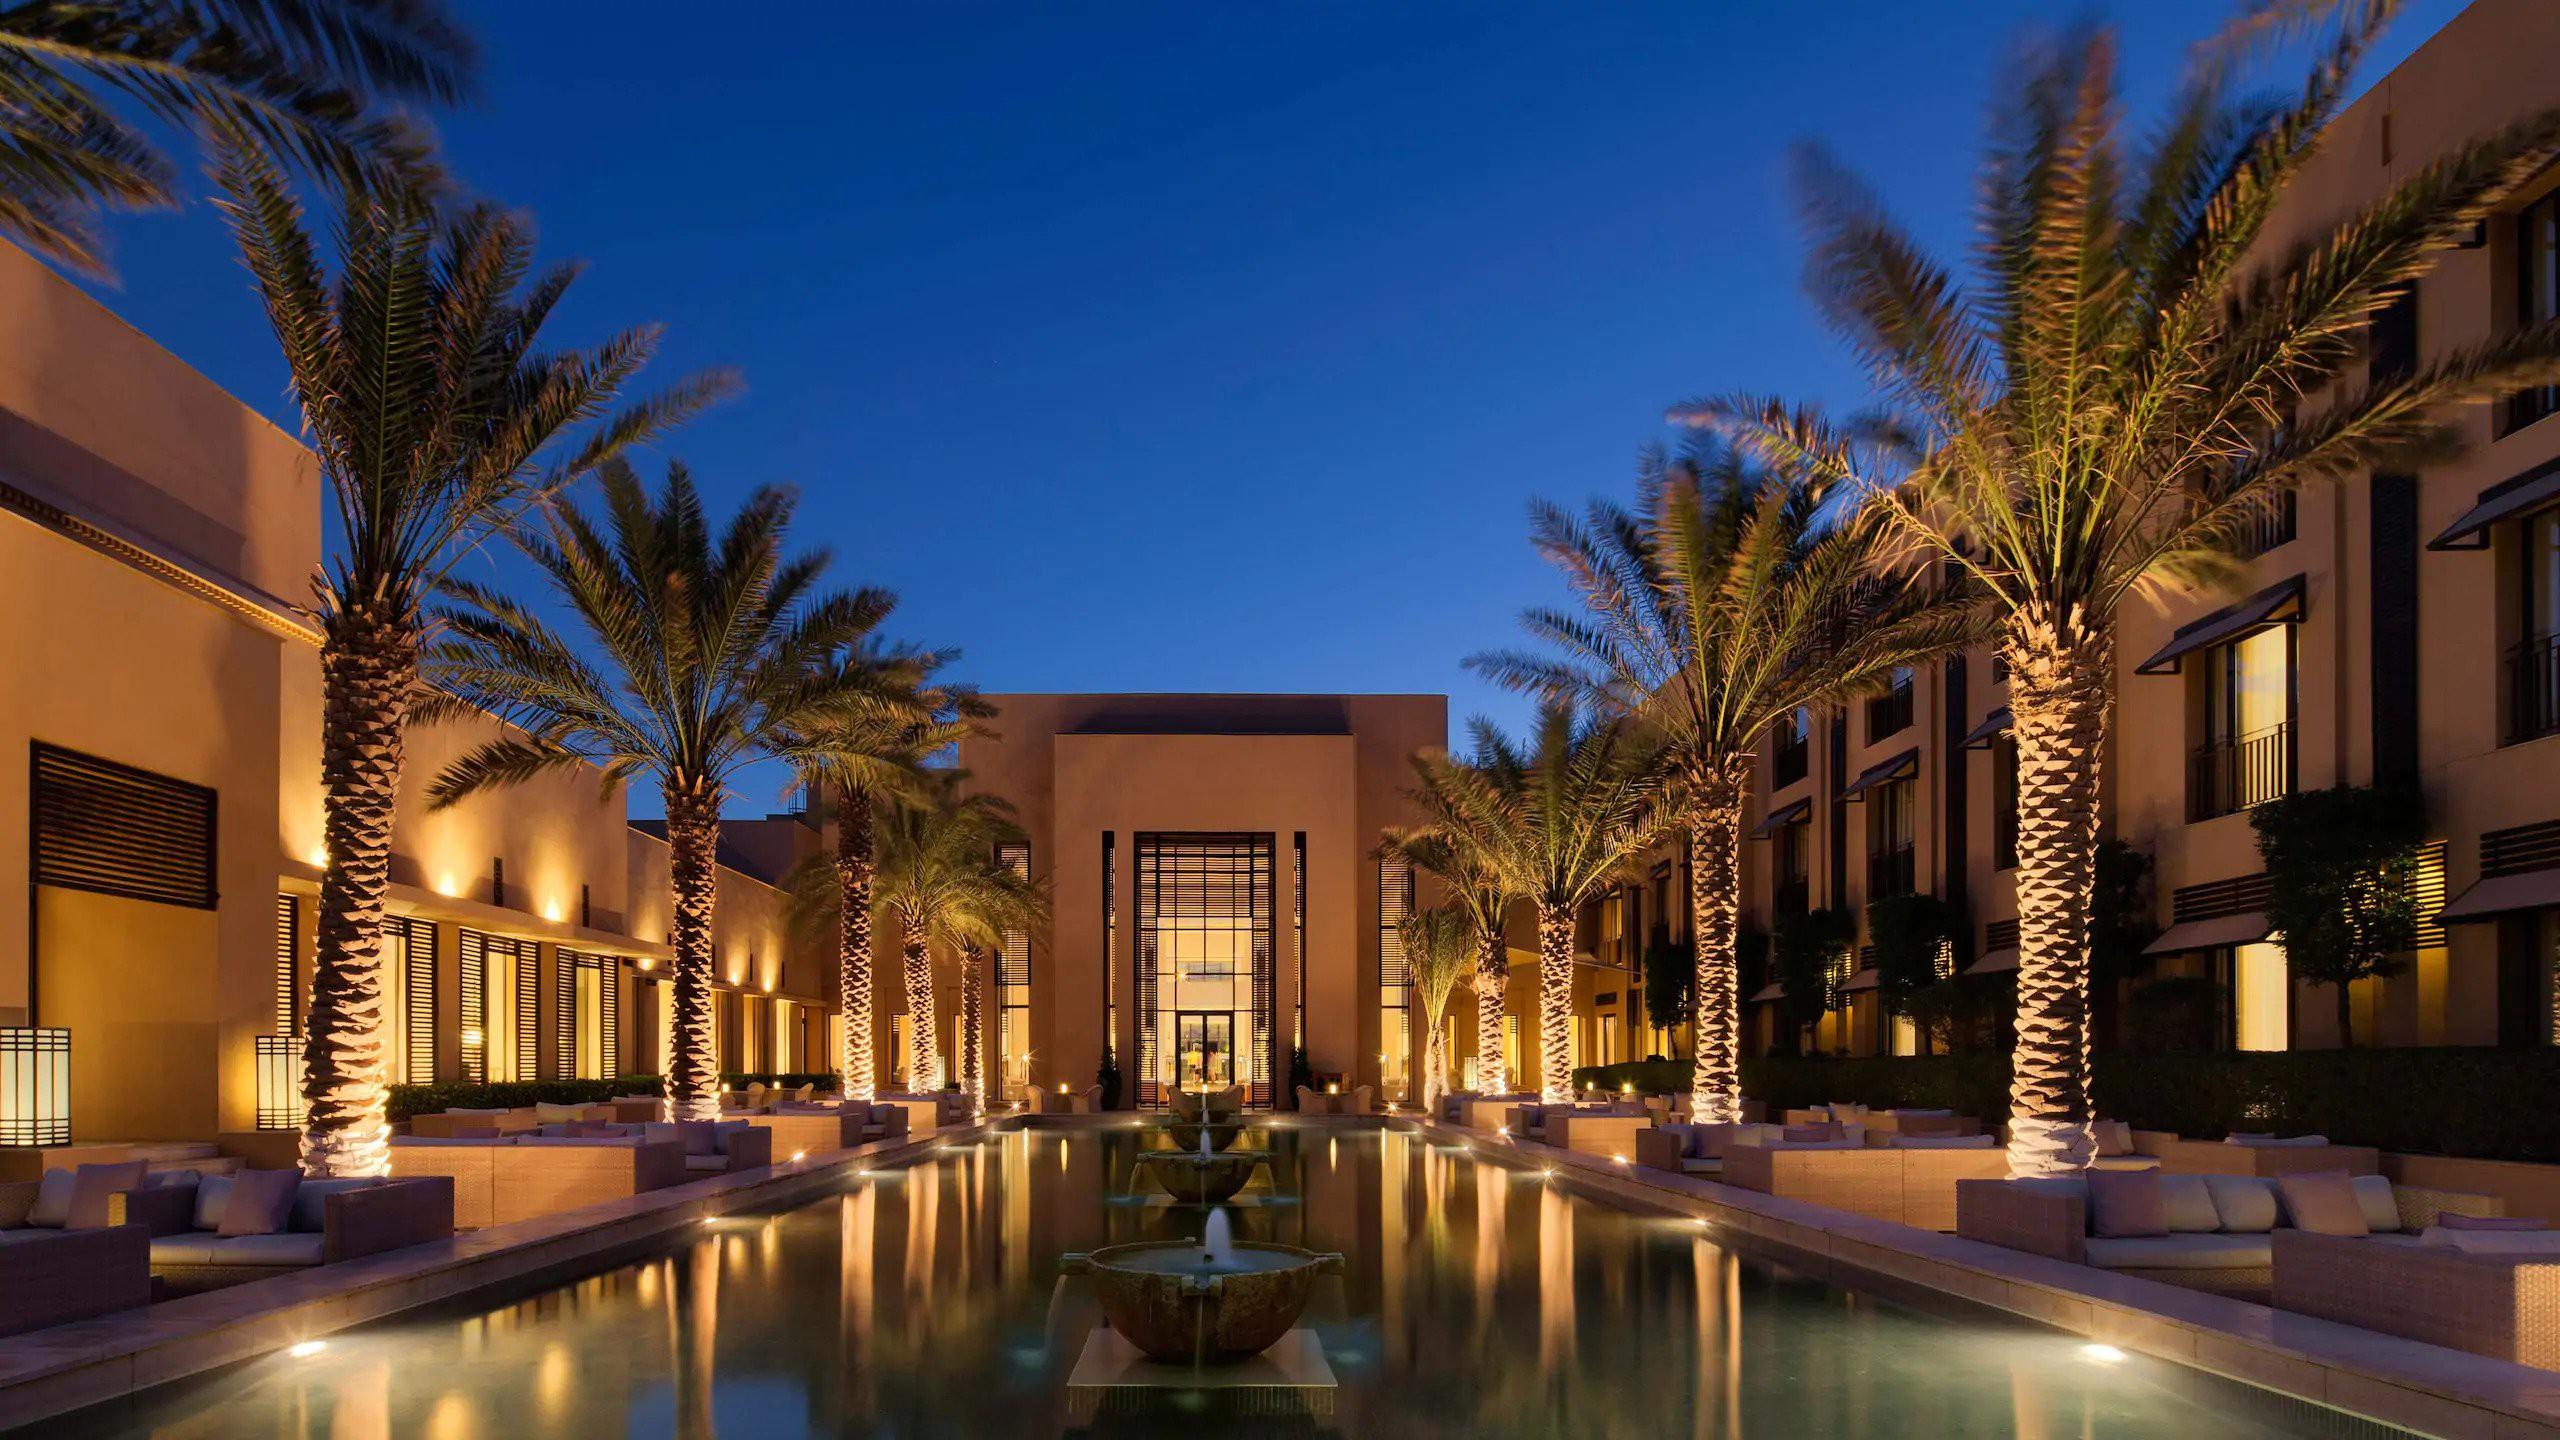 Courtesy of Park Hyatt Jeddah – Marina, Club and Spa / Hotels.com